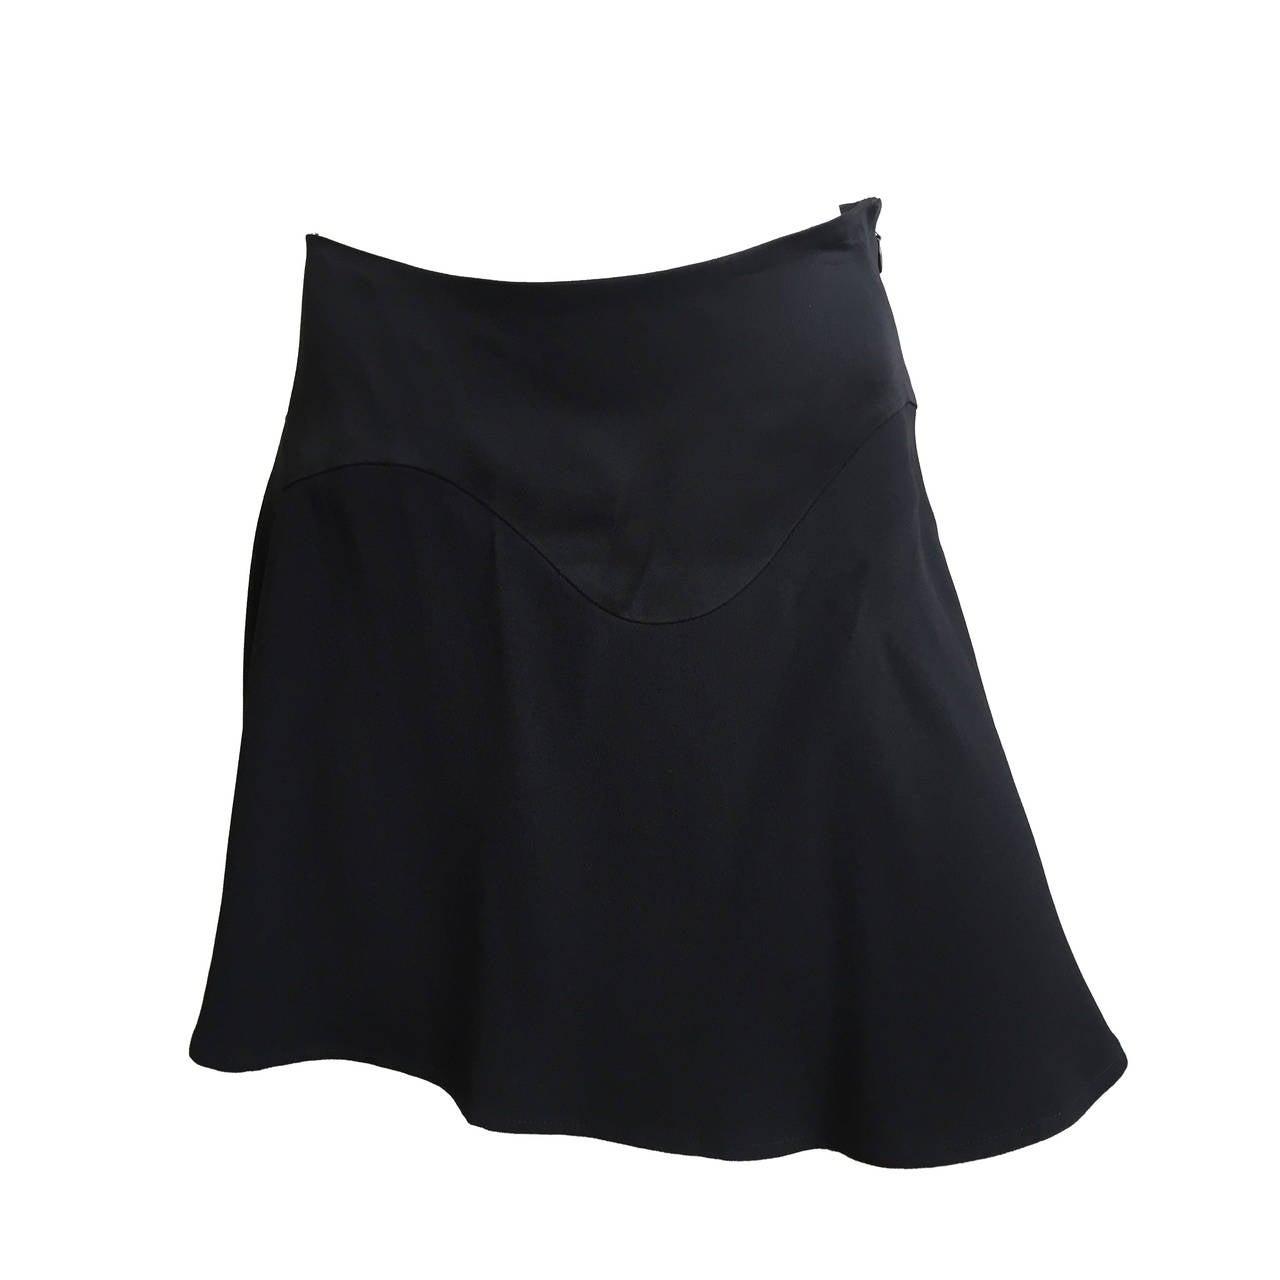 Moschino Black Short Skirt Size 6.